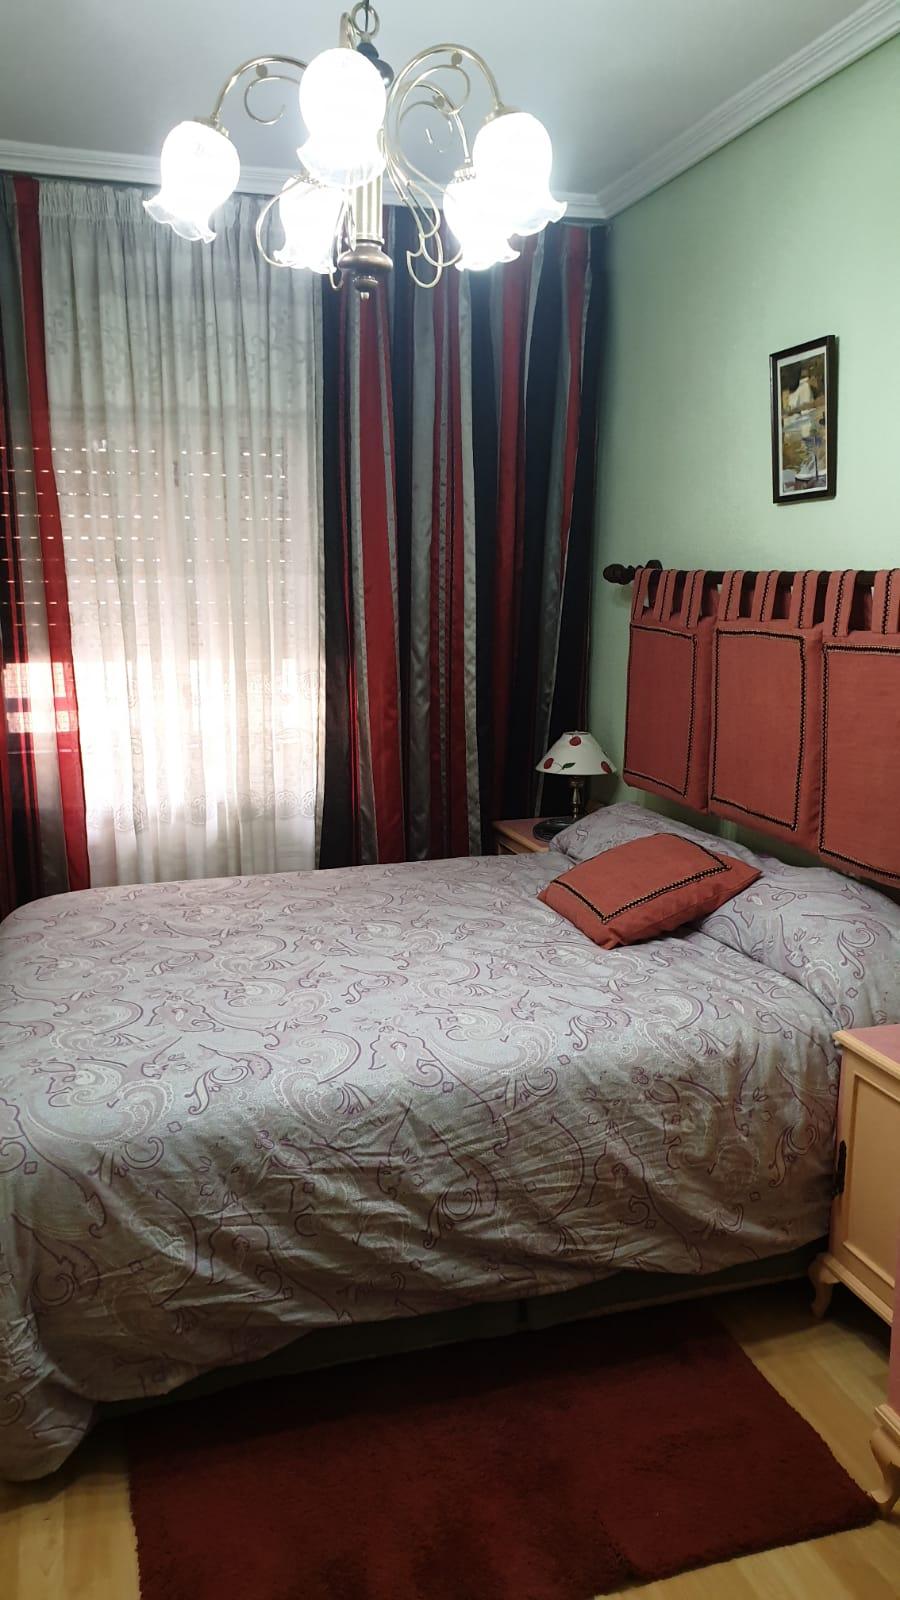 Piso de tres dormitorios junto a corte inglés (REF: 26) - foto 11 1999cec6-86a2-4474-9d7e-e62960edaa2d.jpg